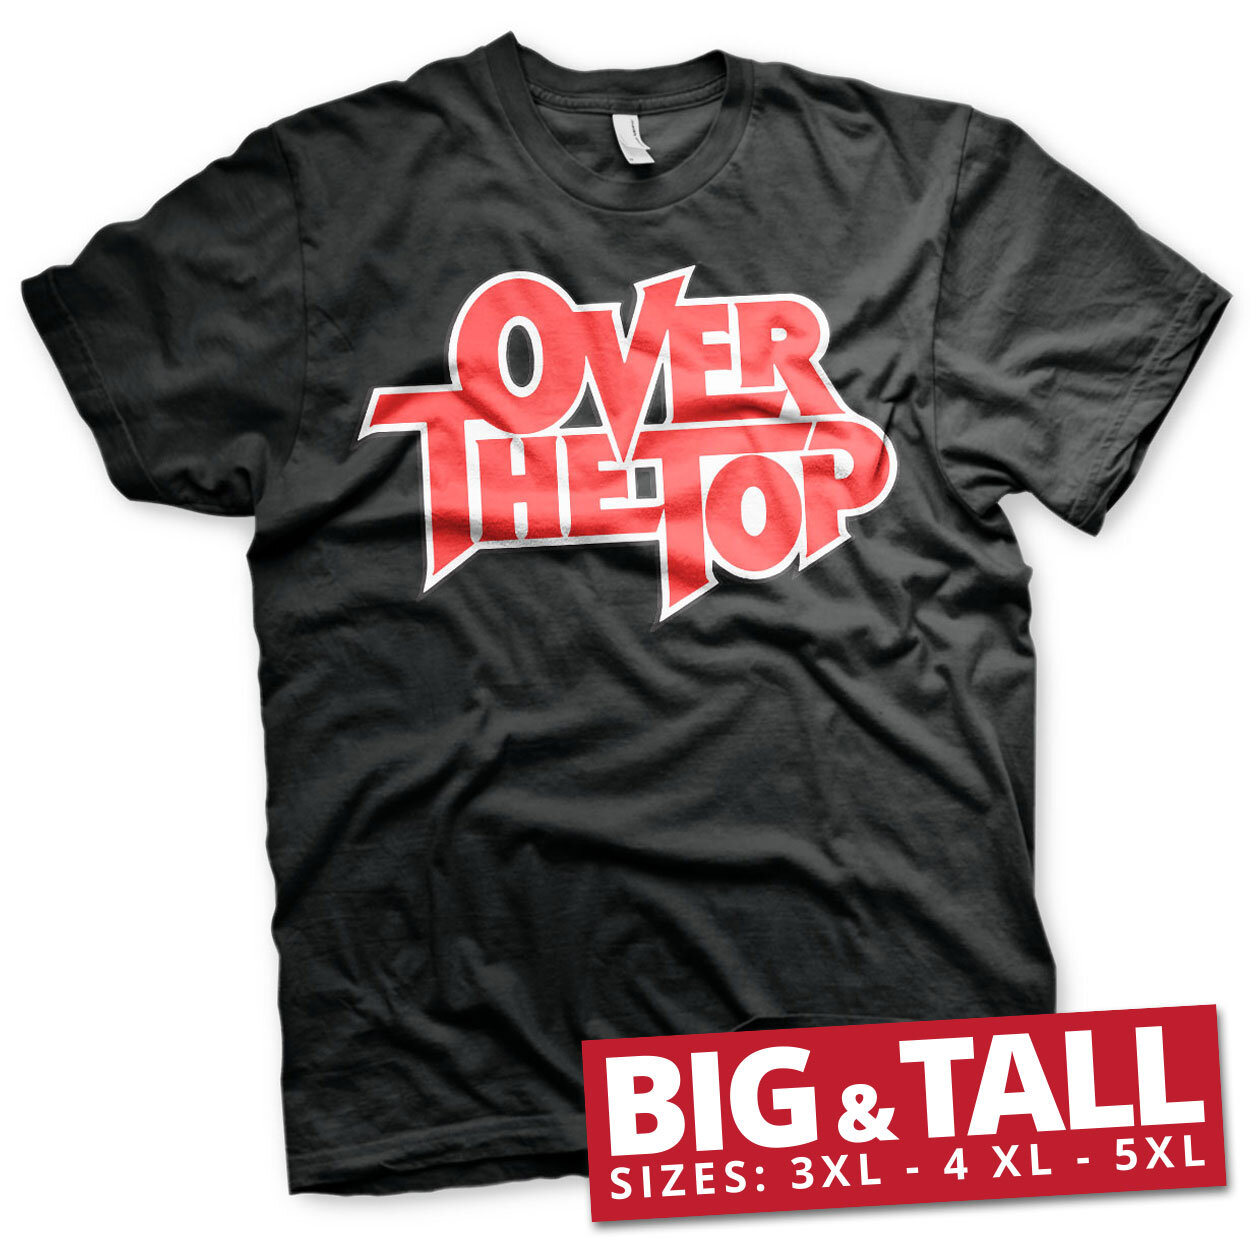 Over The Top Logo Big & Tall T-Shirt